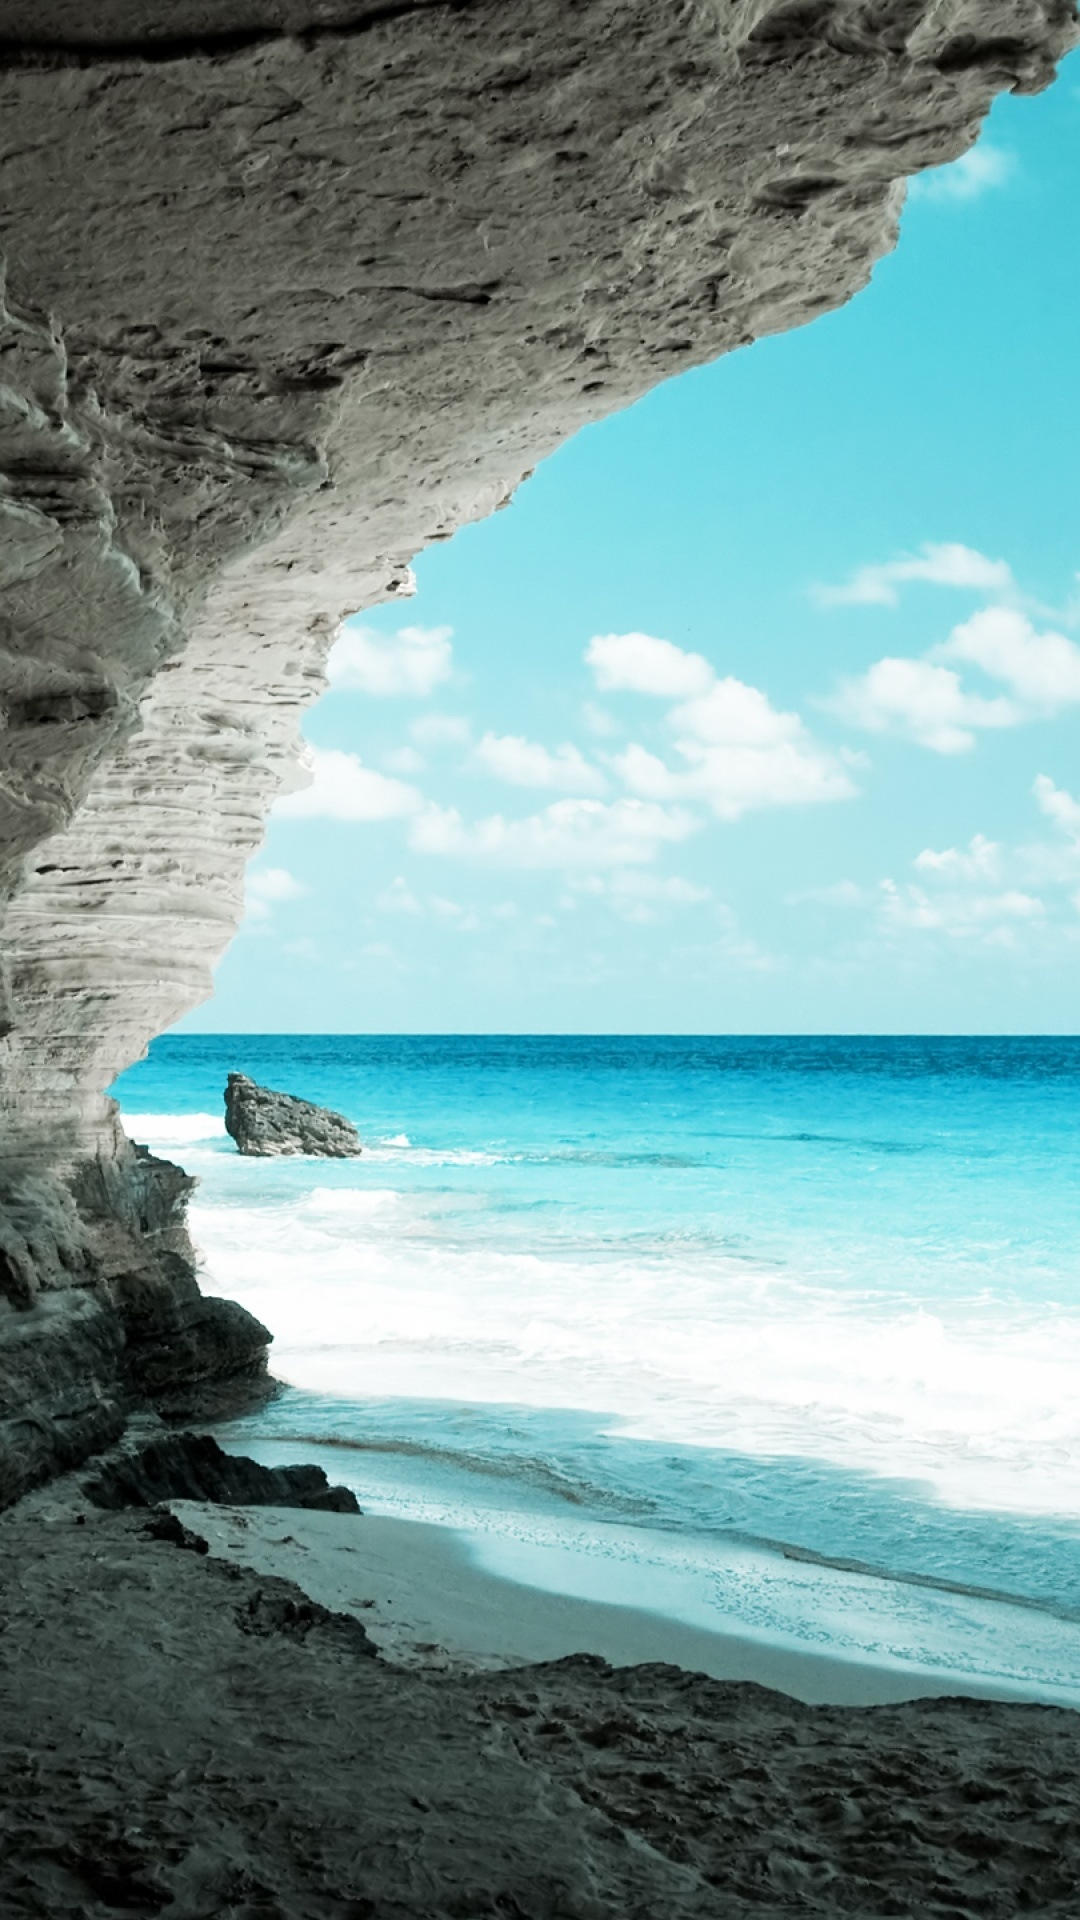 0 Anime Tropical Beach Scenery Mobile Phone Wallpaper Sea